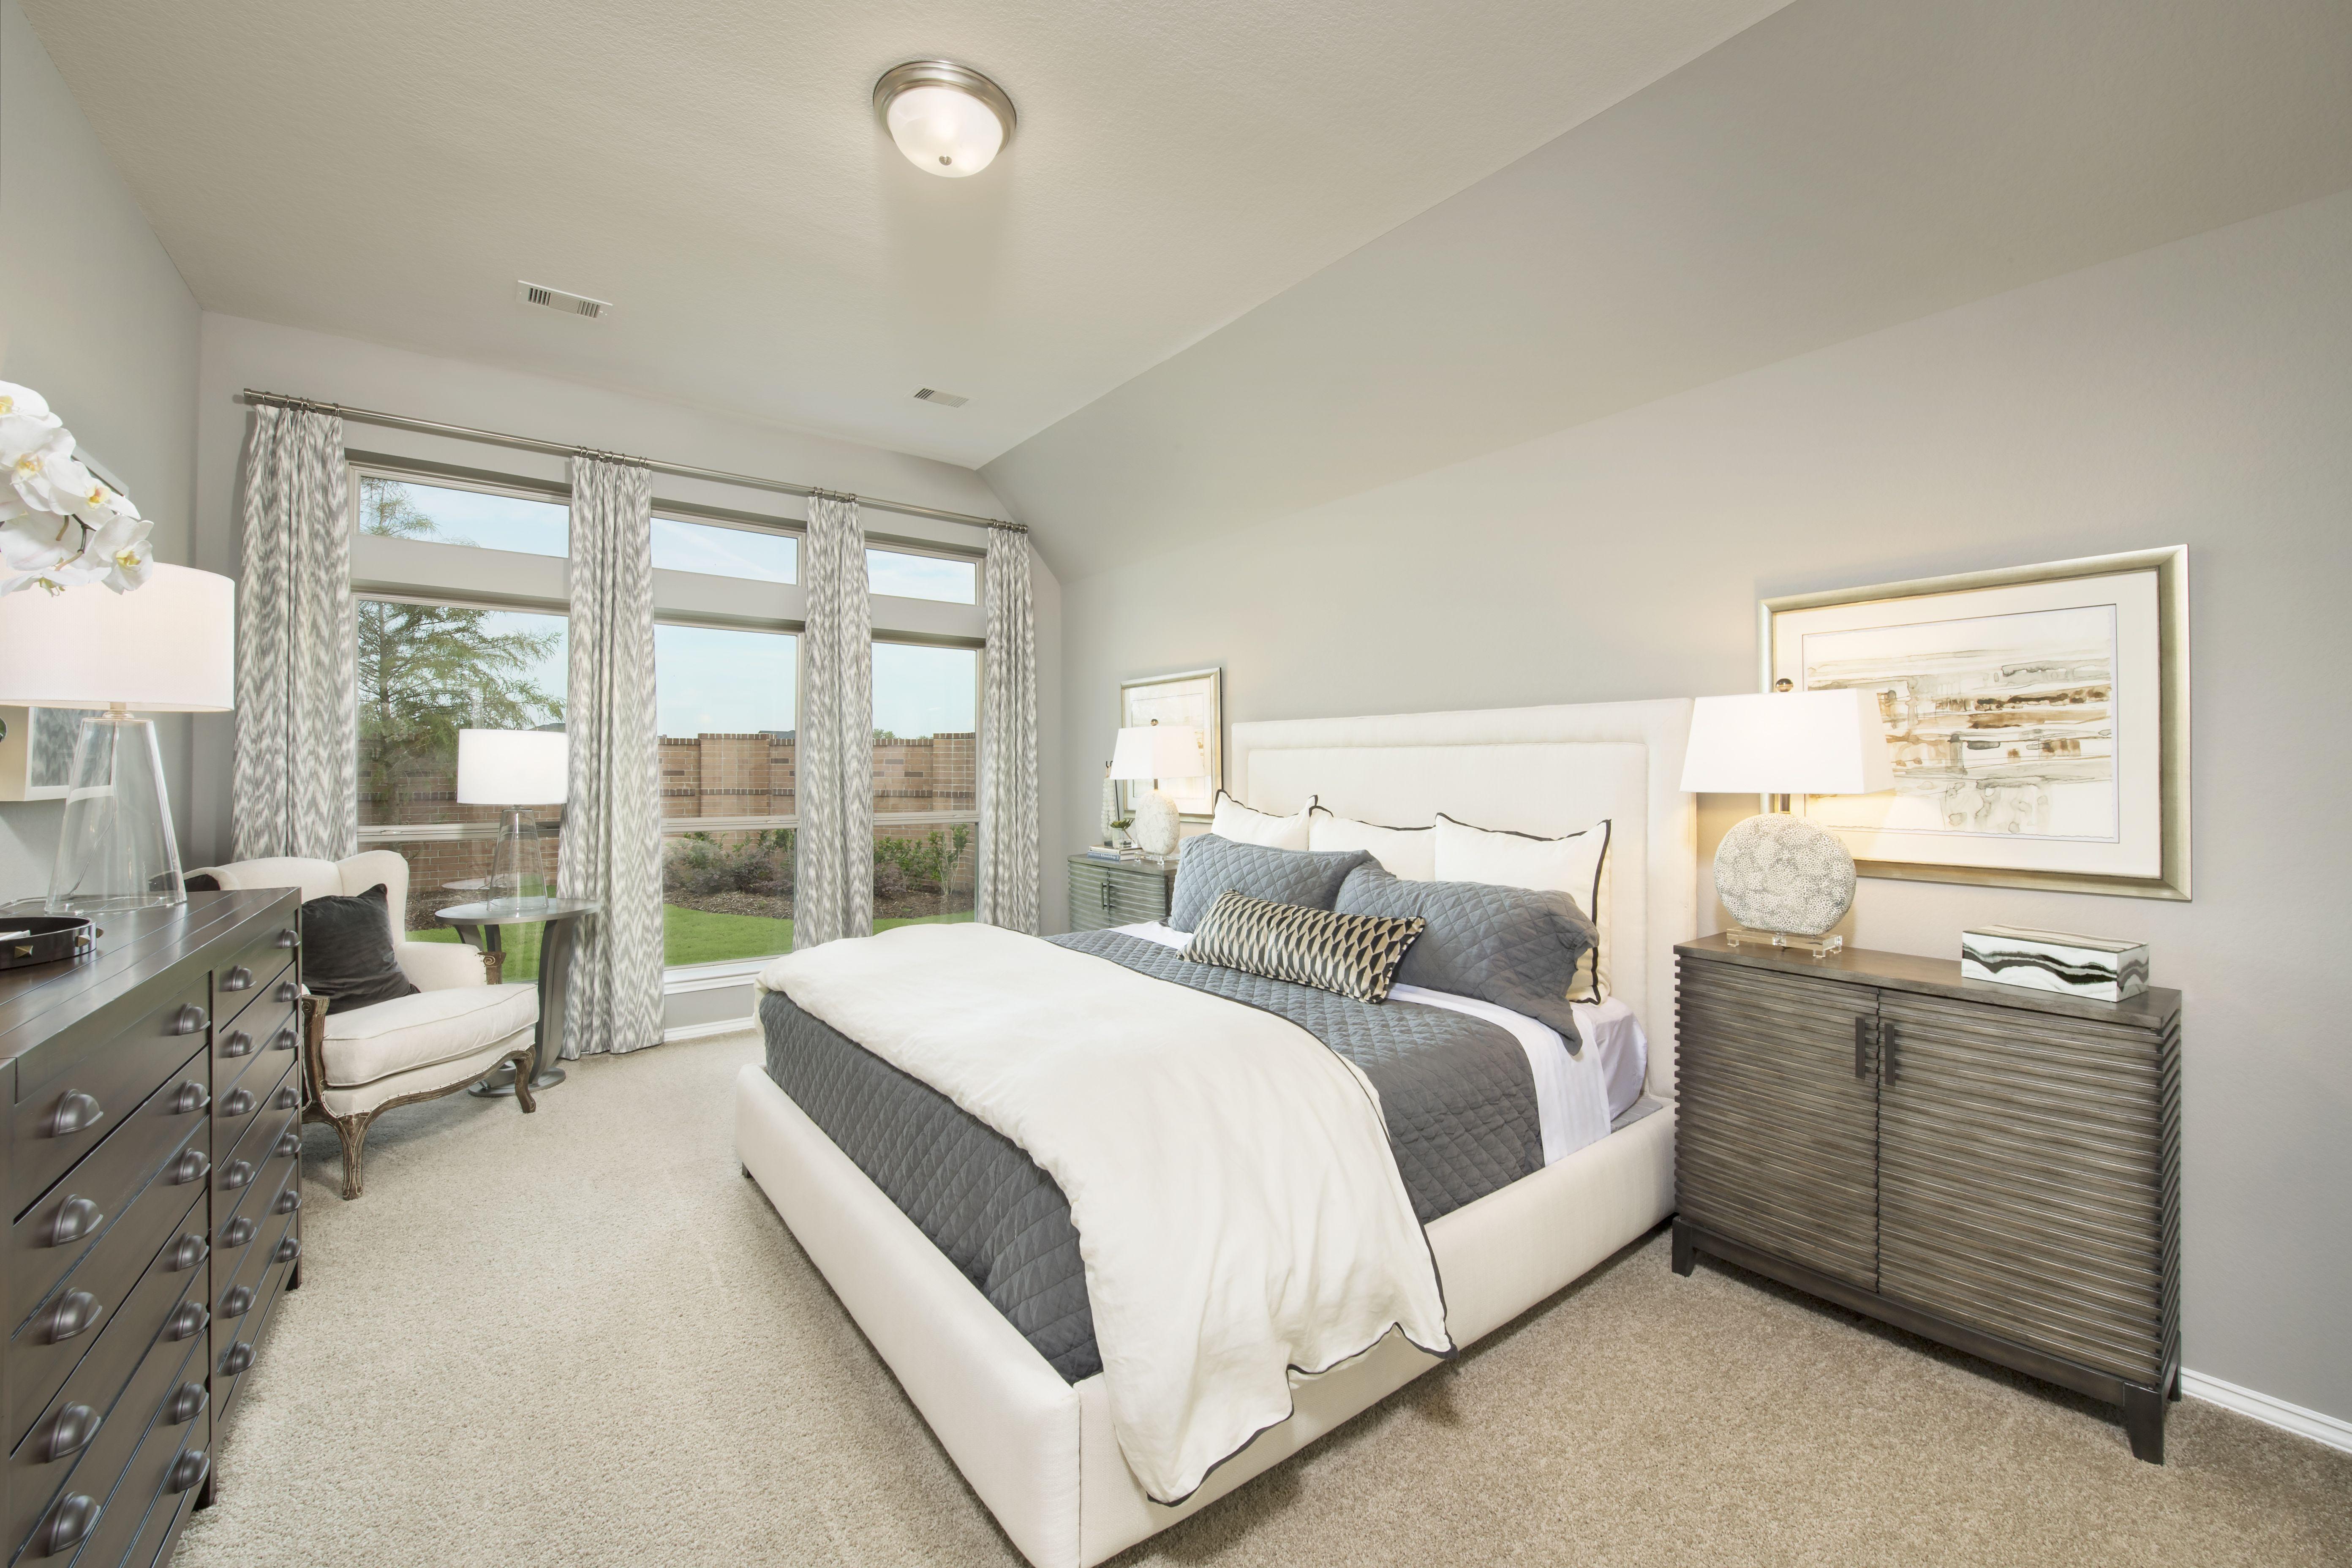 Lakes Of Bella Terra Model Home 2 267 Sq Ft Master Bedroom